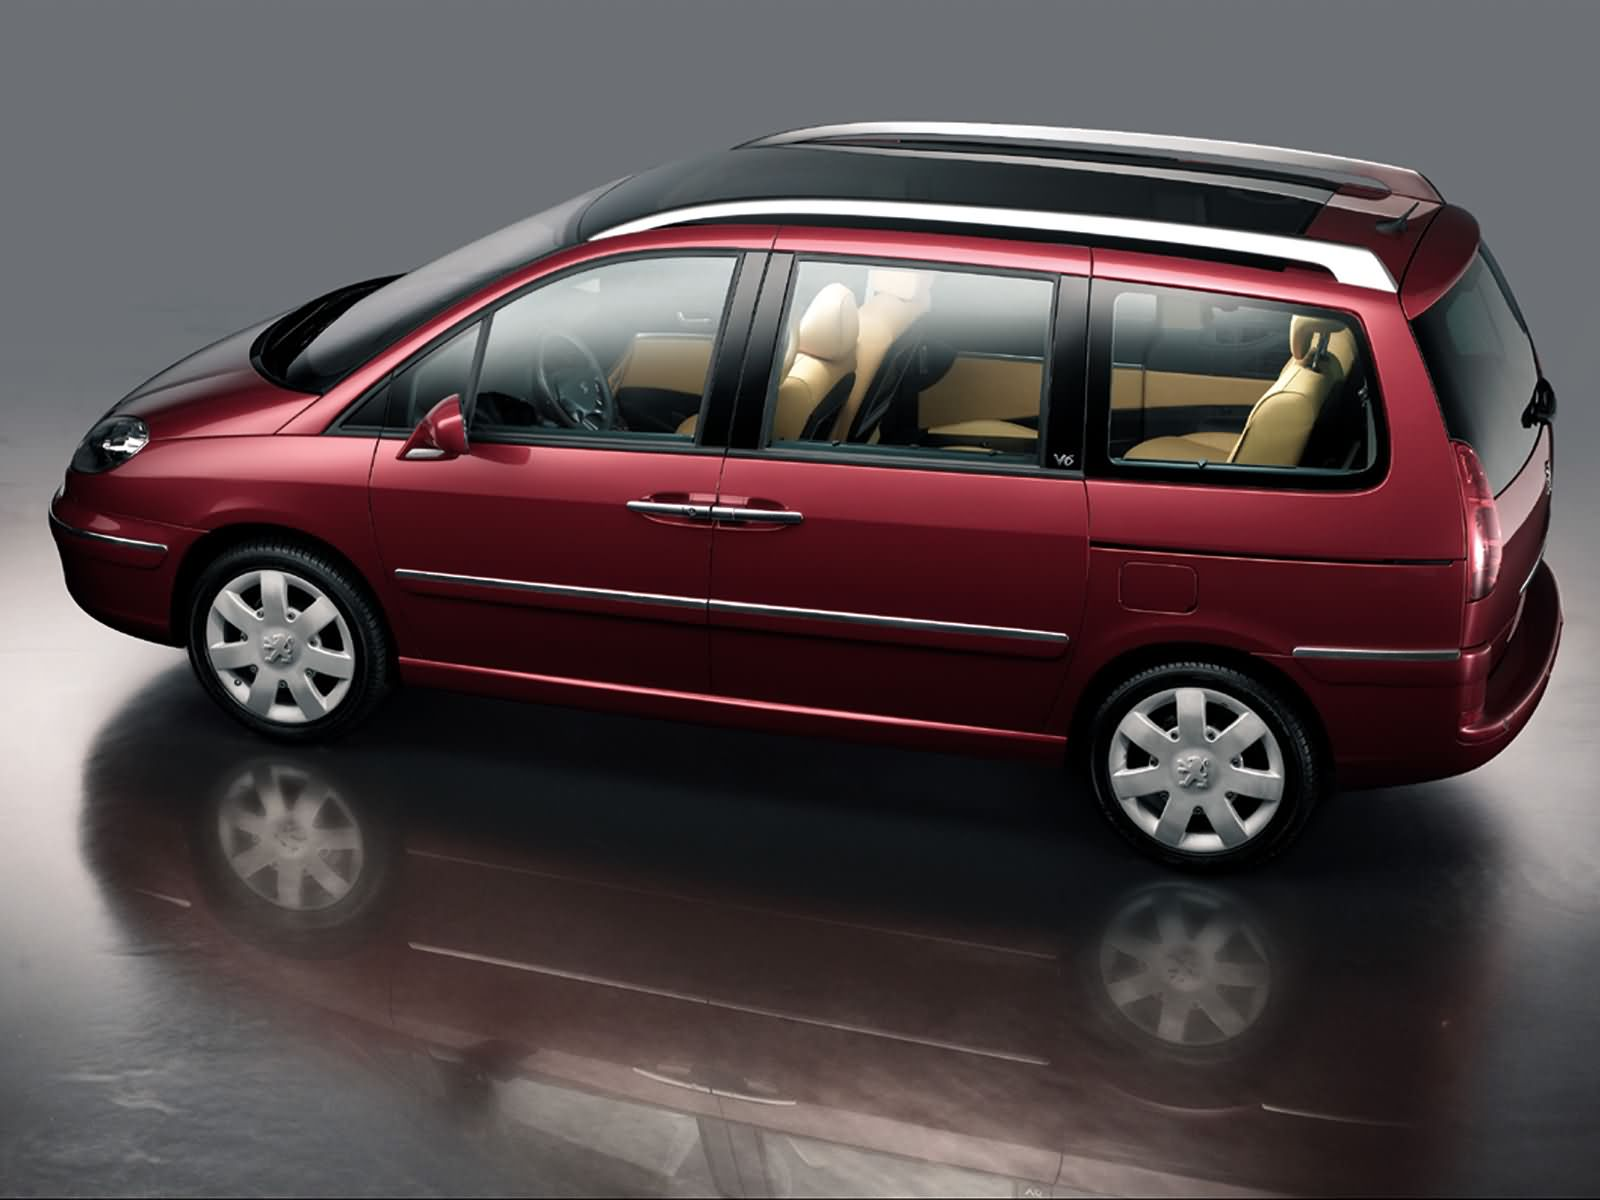 peugeot 807 picture 4 reviews news specs buy car. Black Bedroom Furniture Sets. Home Design Ideas